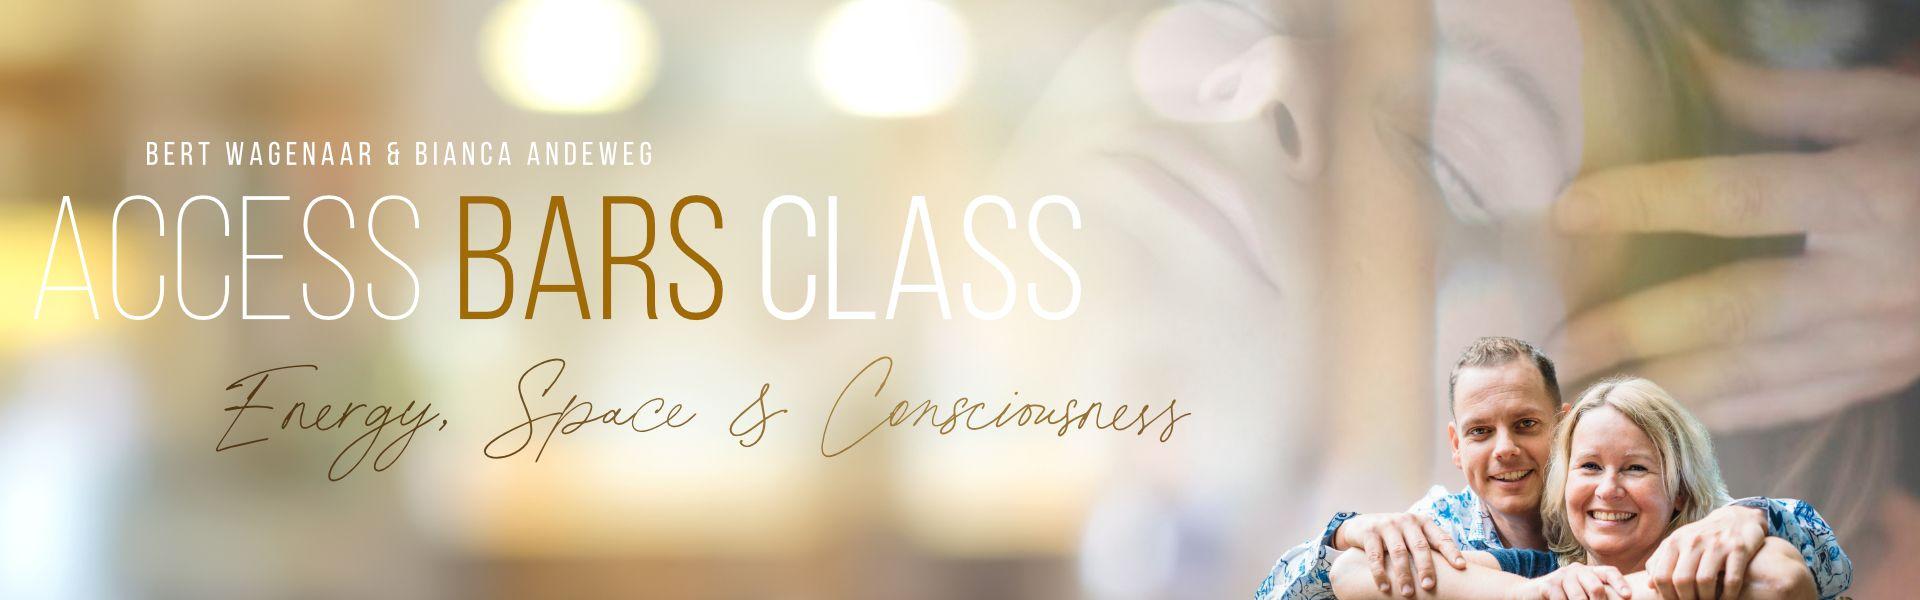 Access Bars Class